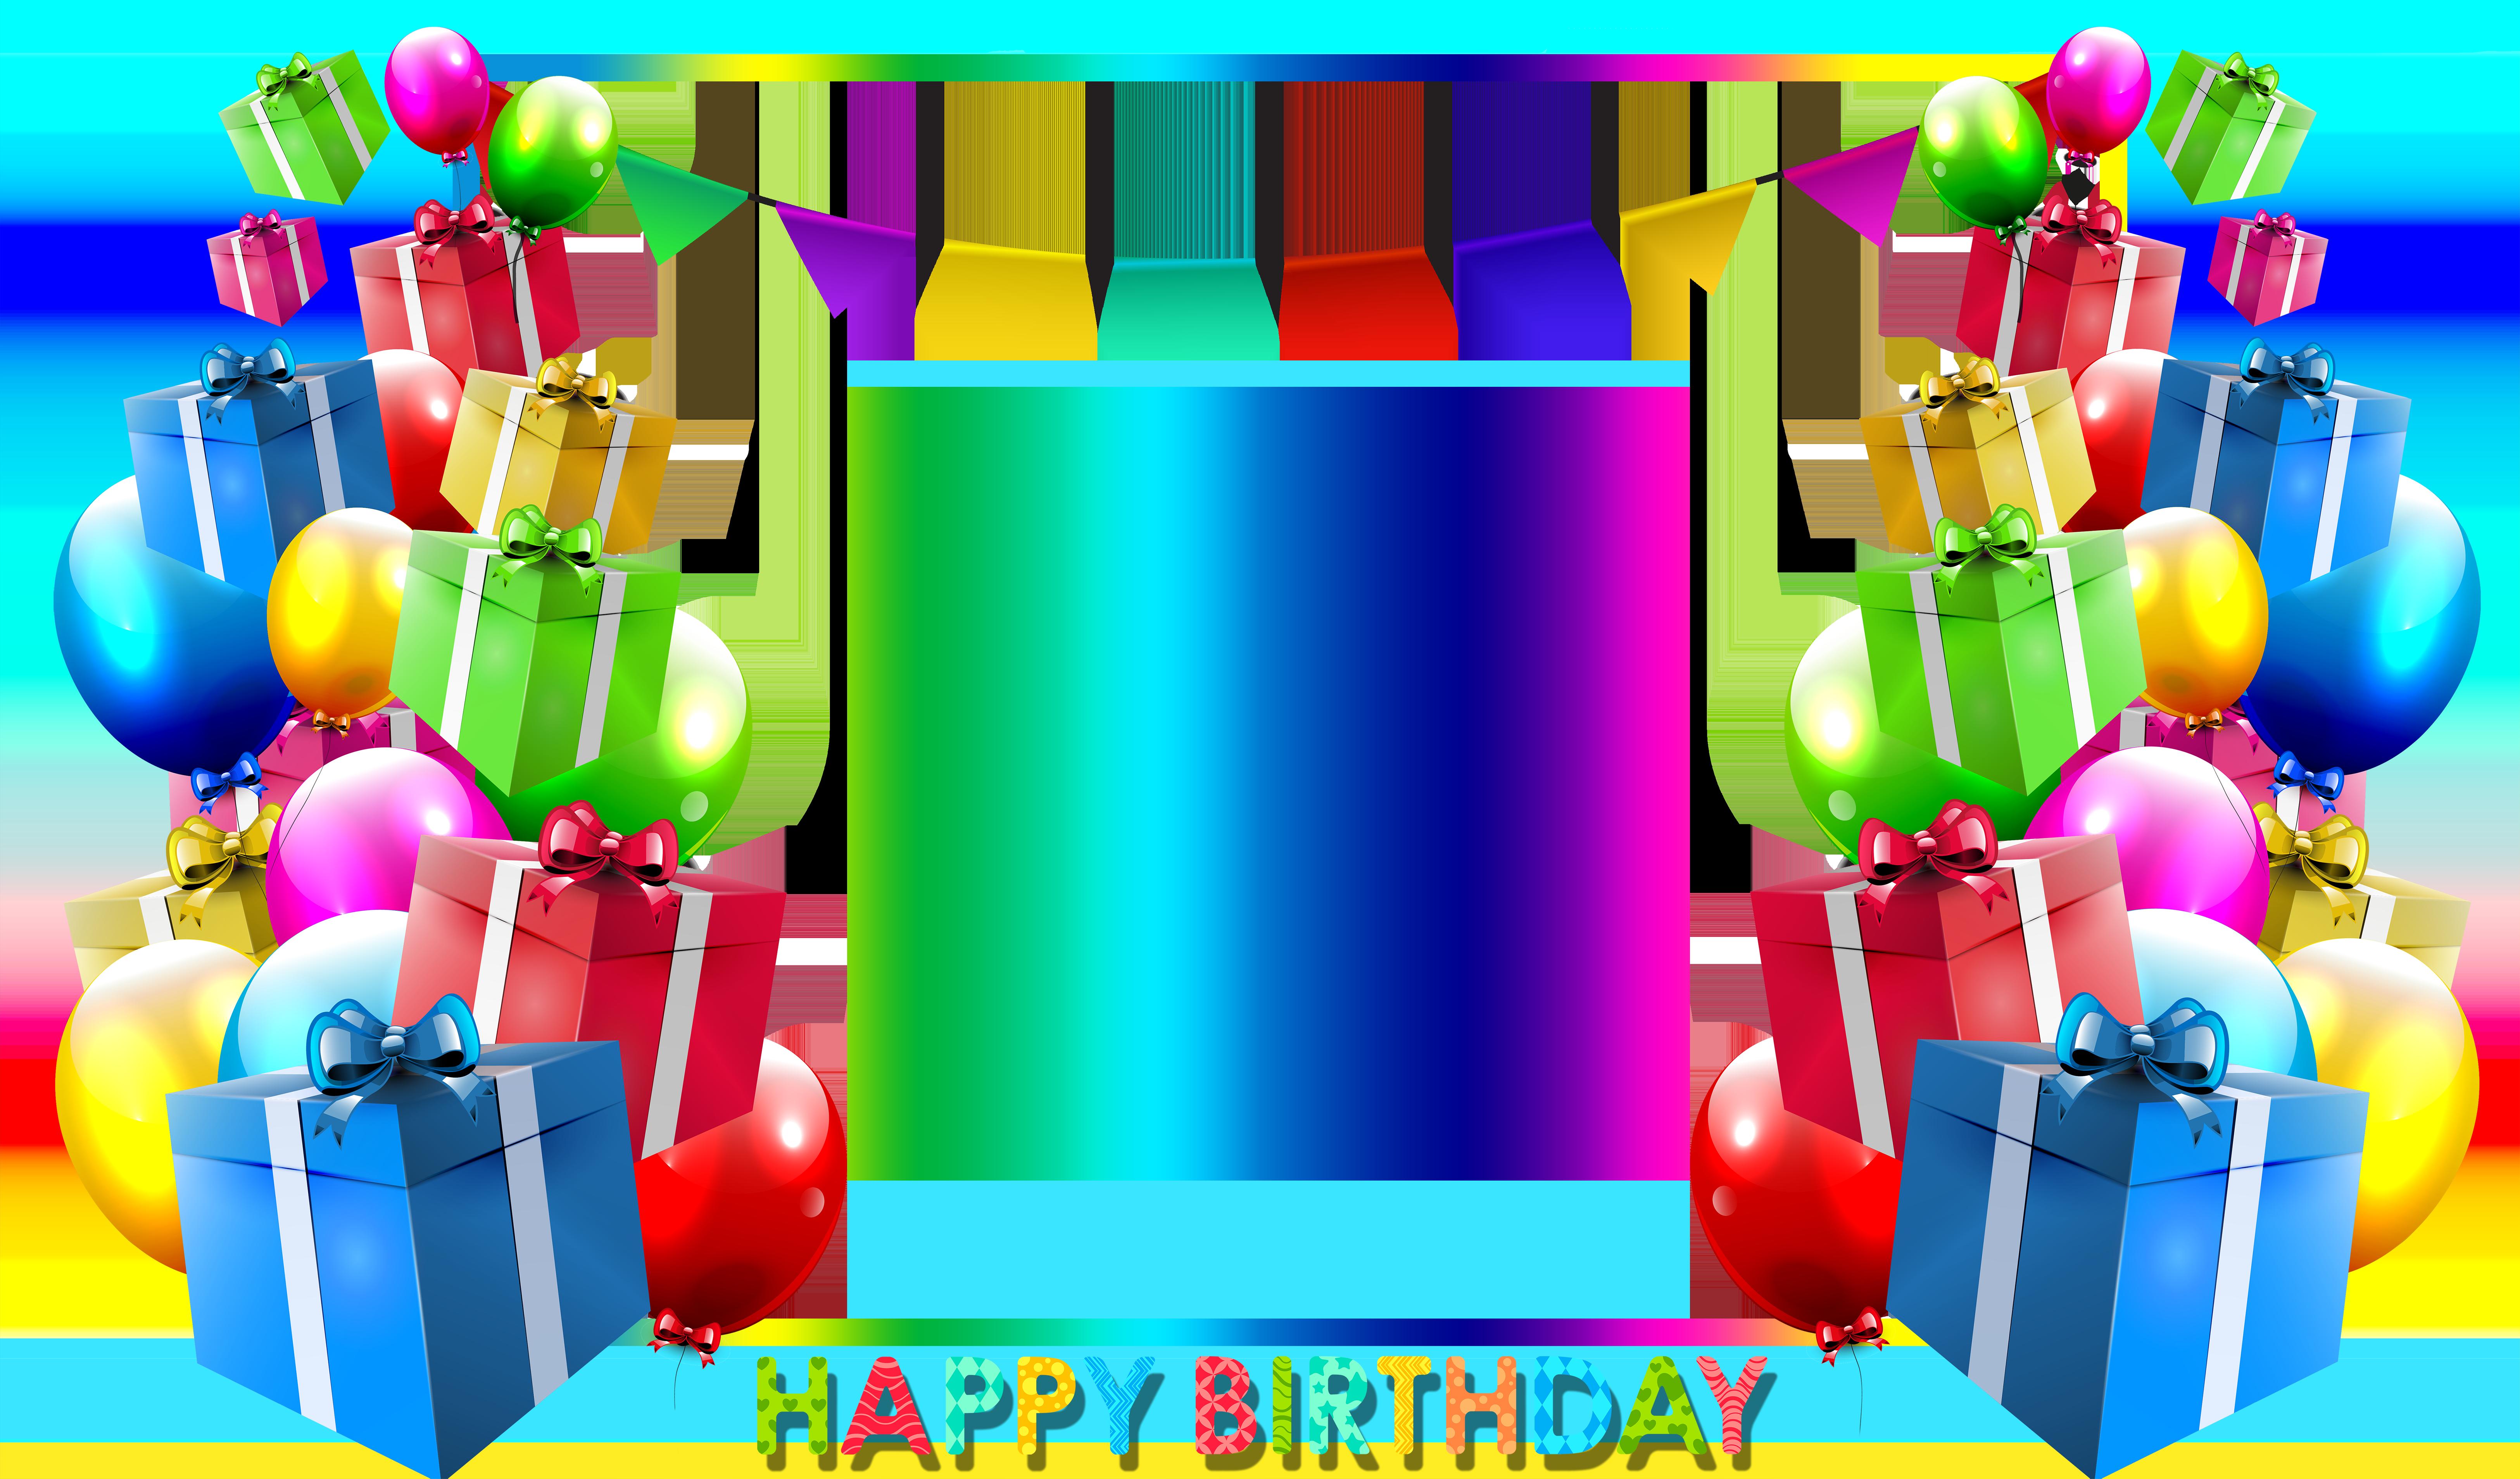 Happy Birthday Png Blue Photo Frame Dengan Gambar